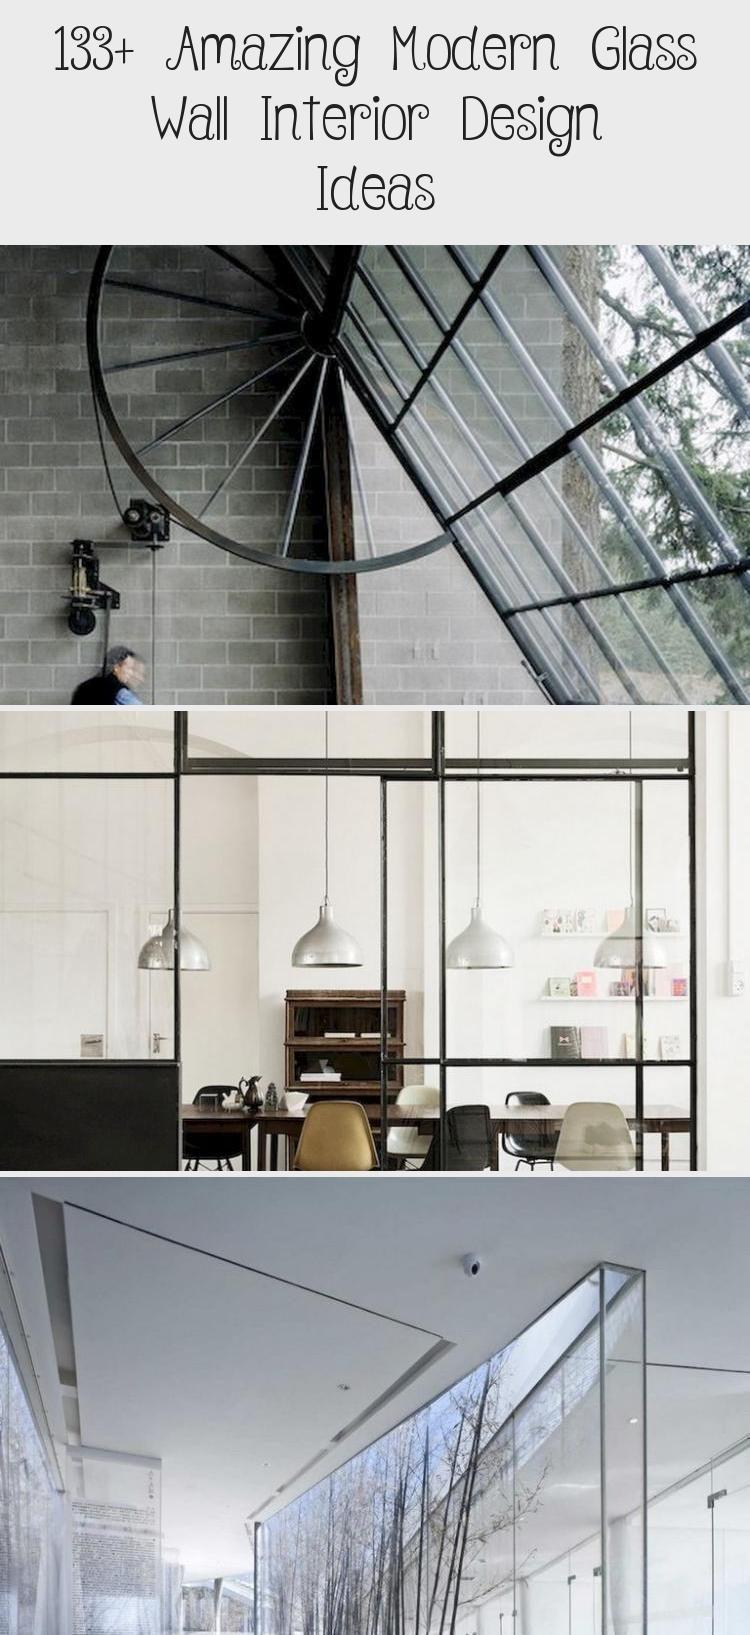 133+ Amazing Modern Glass Wall Interior Design Ideas #interiordesign #interiordesignideas #interiordesignstyles #interiordesignOffice #interiordesignIndustrial #interiordesignScandinavian #Traditionalinteriordesign #interiordesign2019